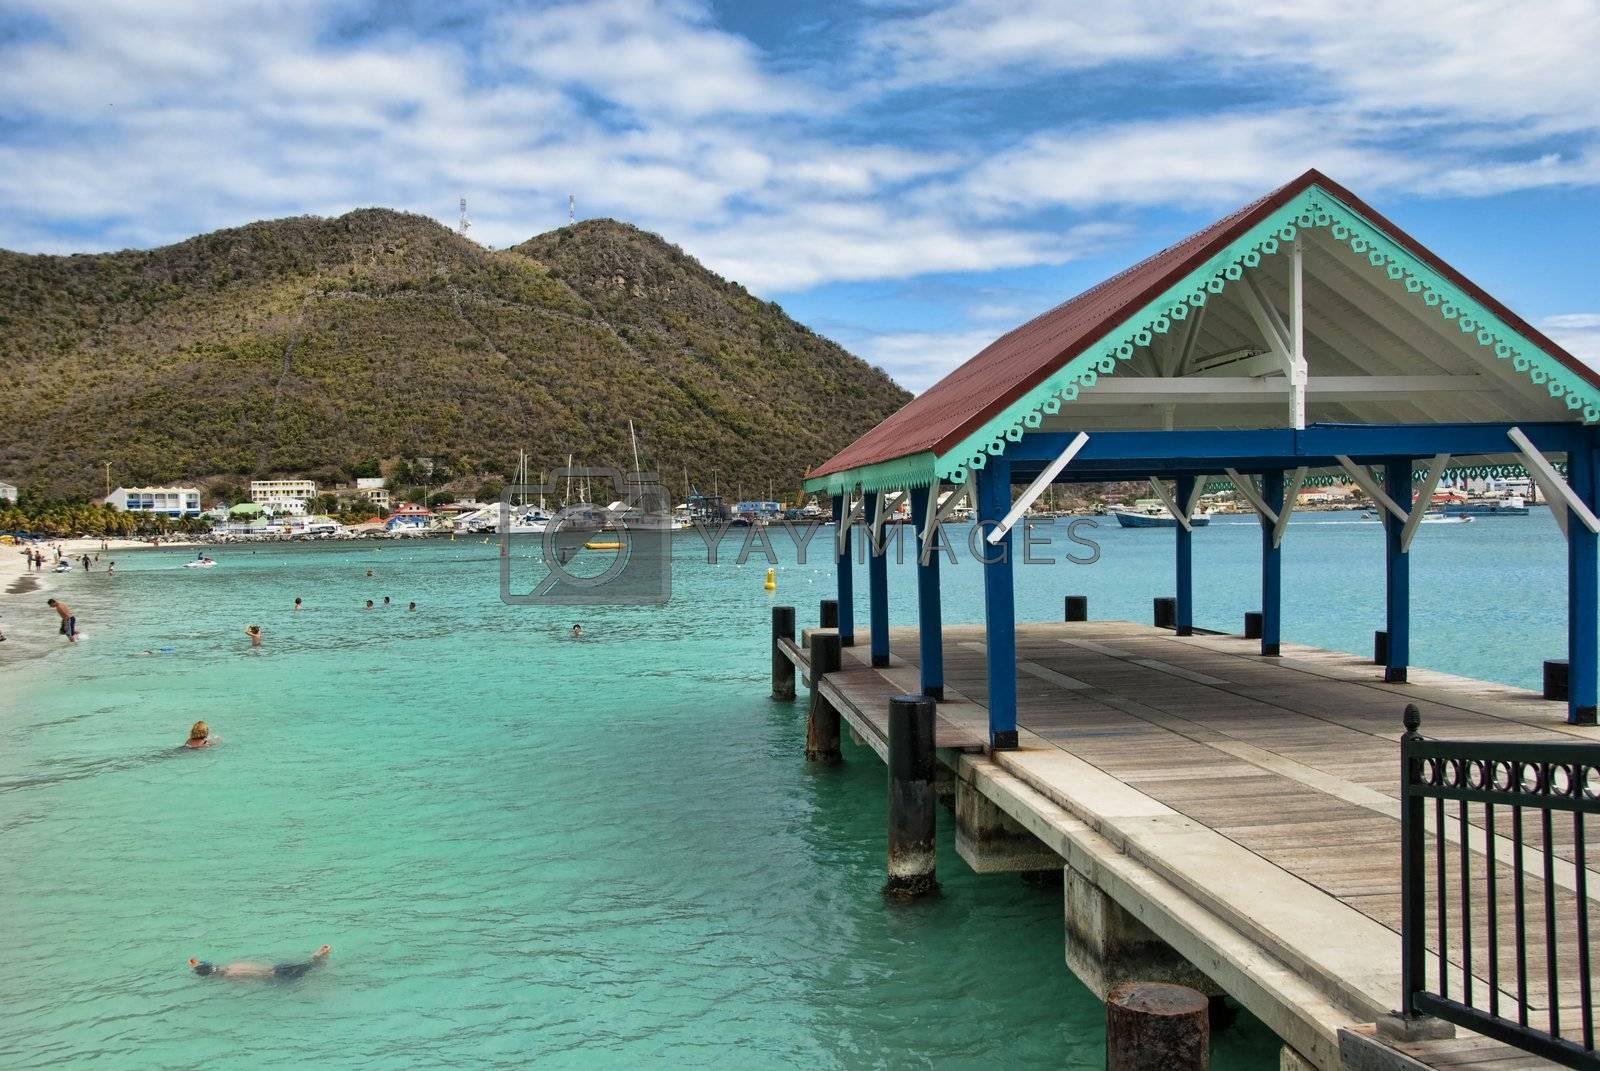 Coast in Saint Maarten Island, Dutch Antilles by jovannig